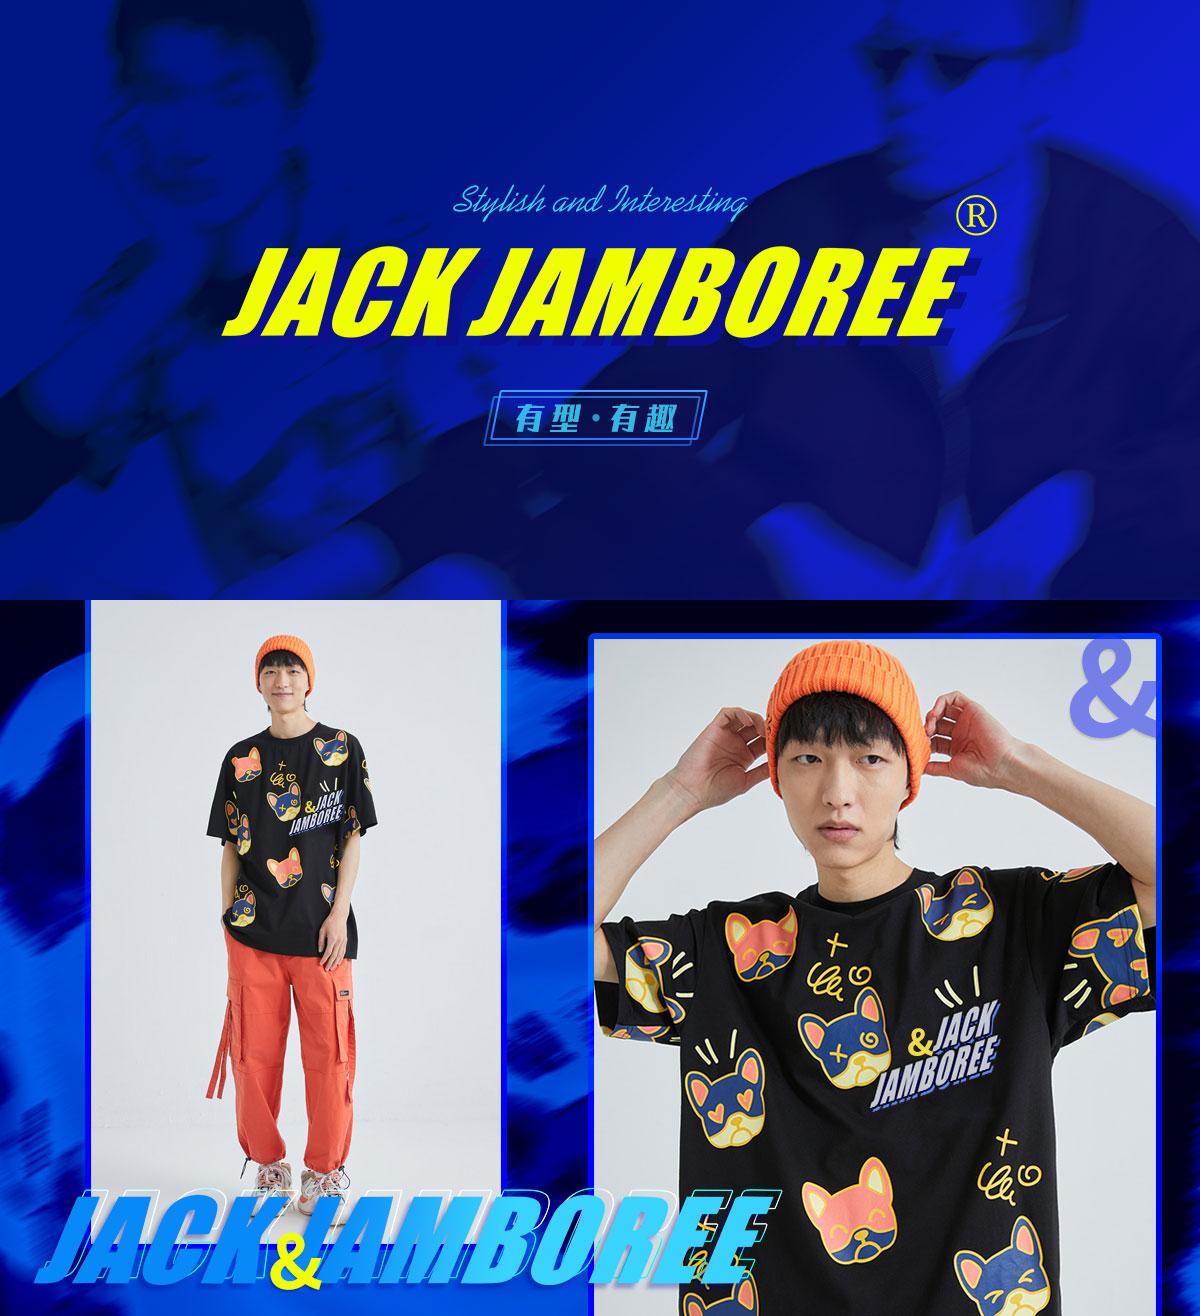 JACK JAMBOREE